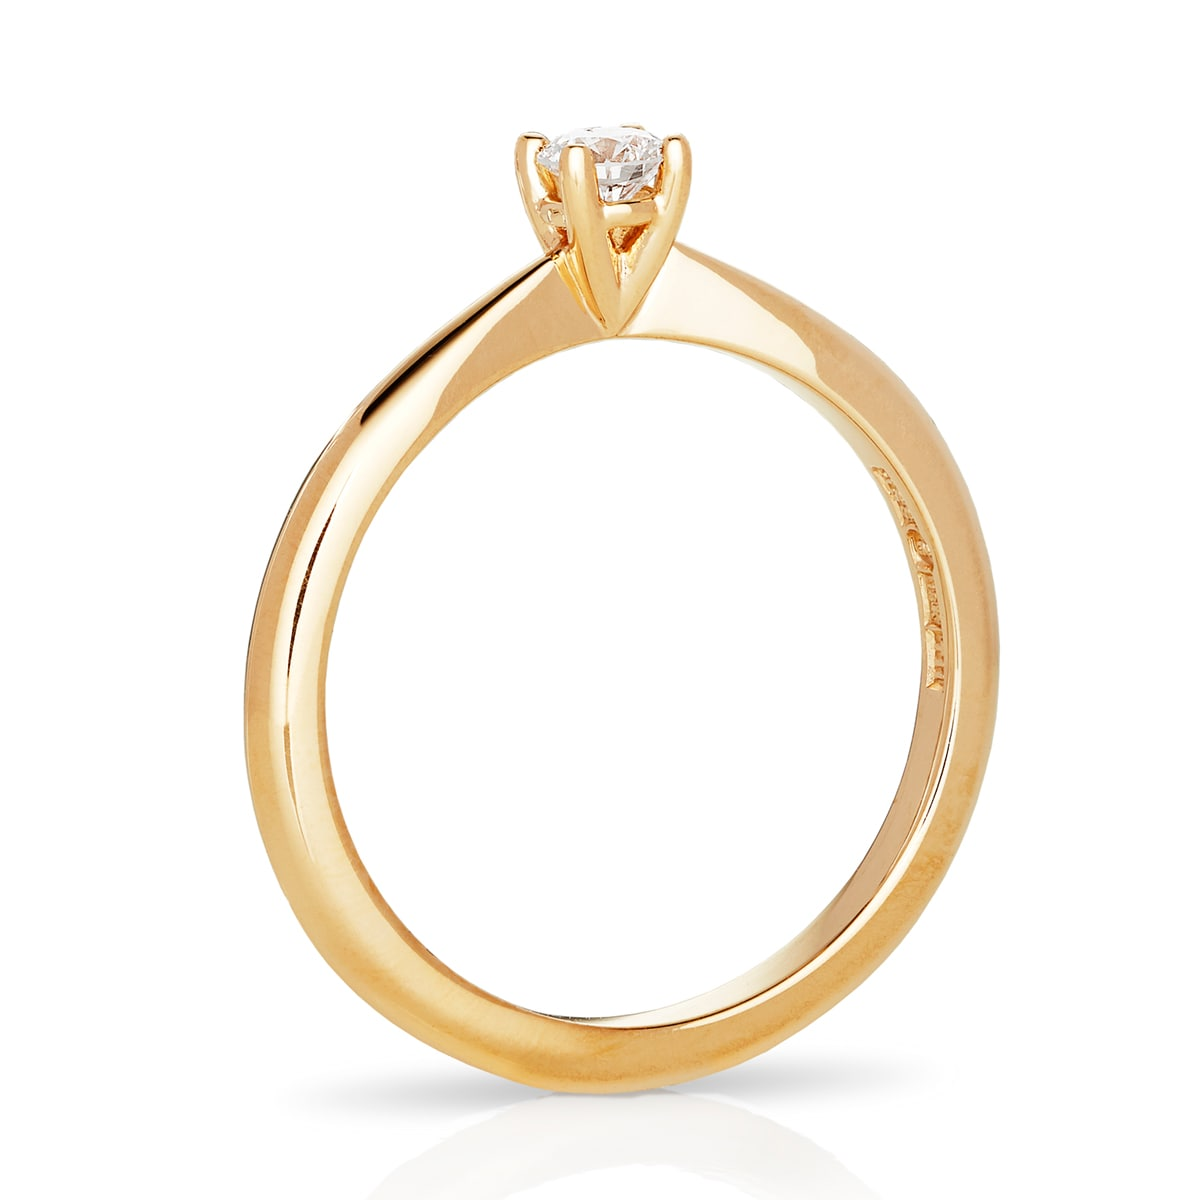 Classic_Ring_RG_0,15ct_0367_FS_hos_Jarl_Sandin